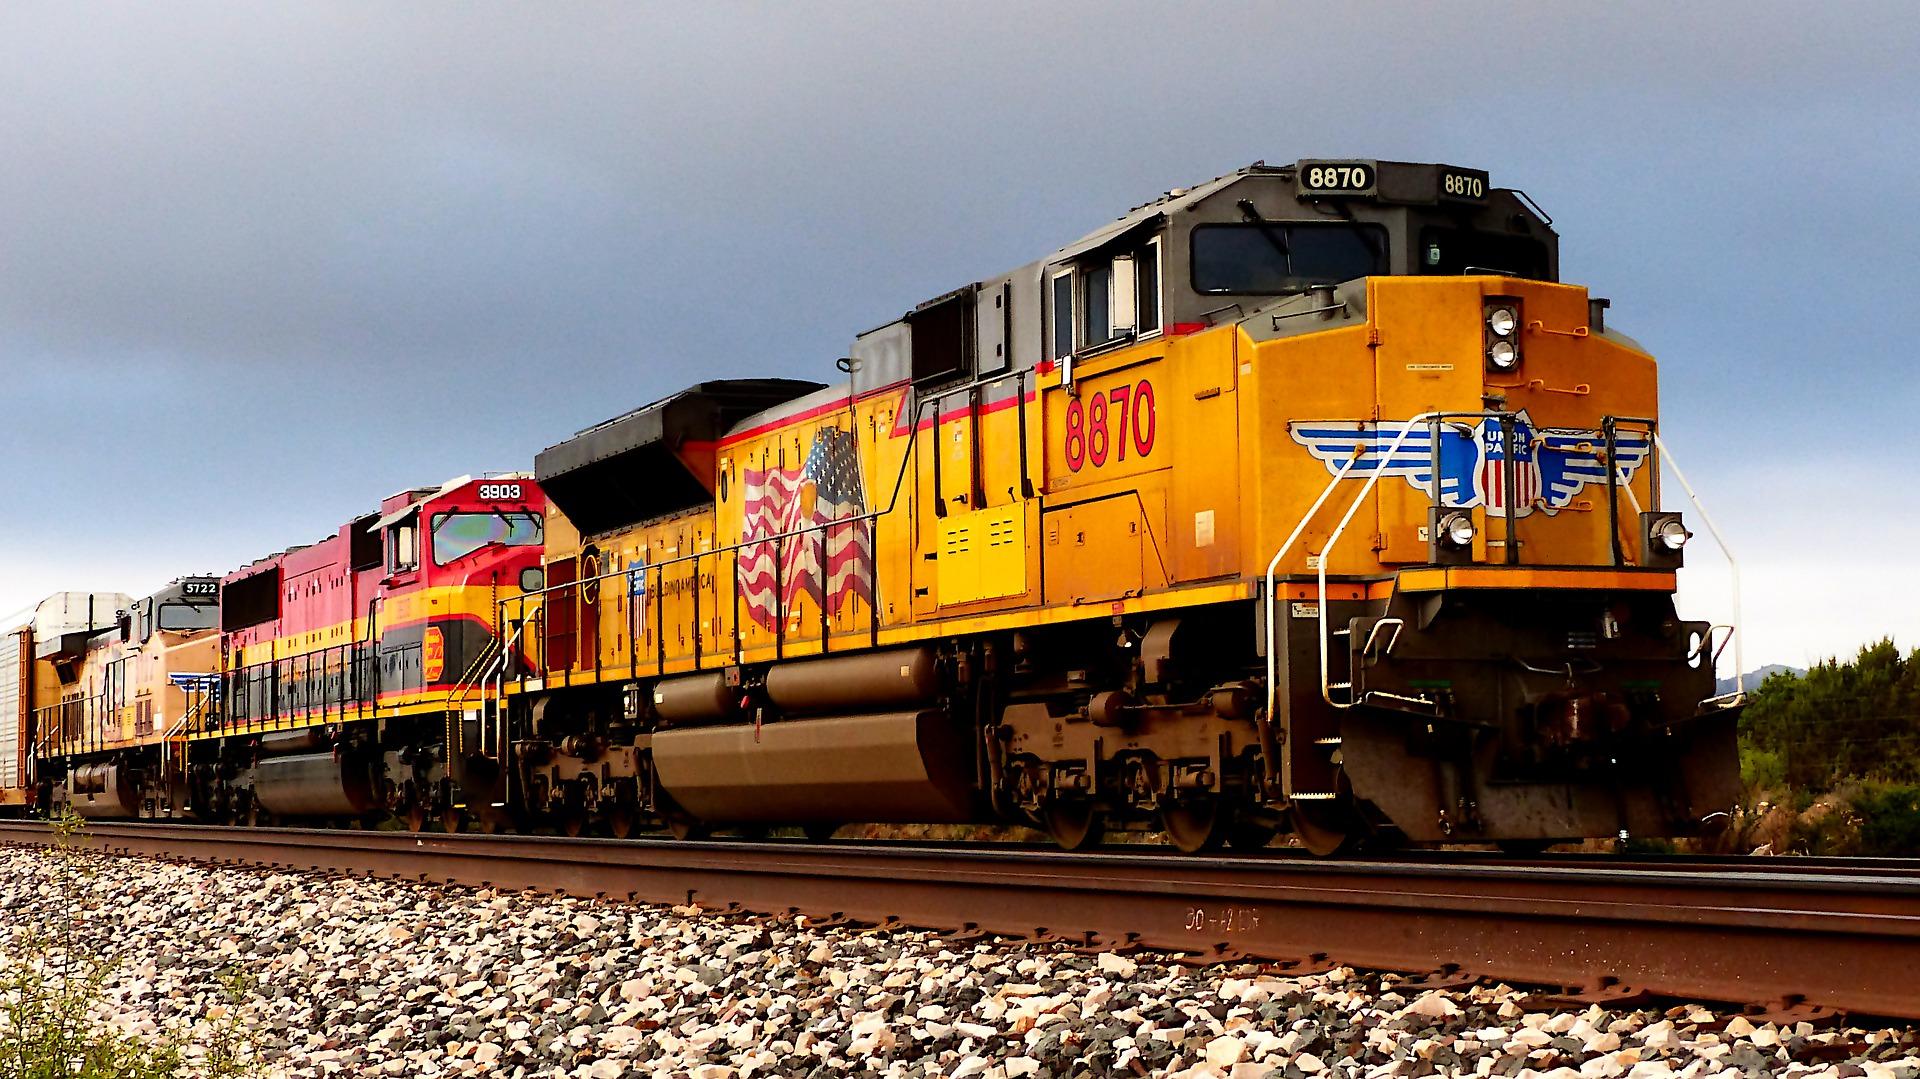 freight train on tracks